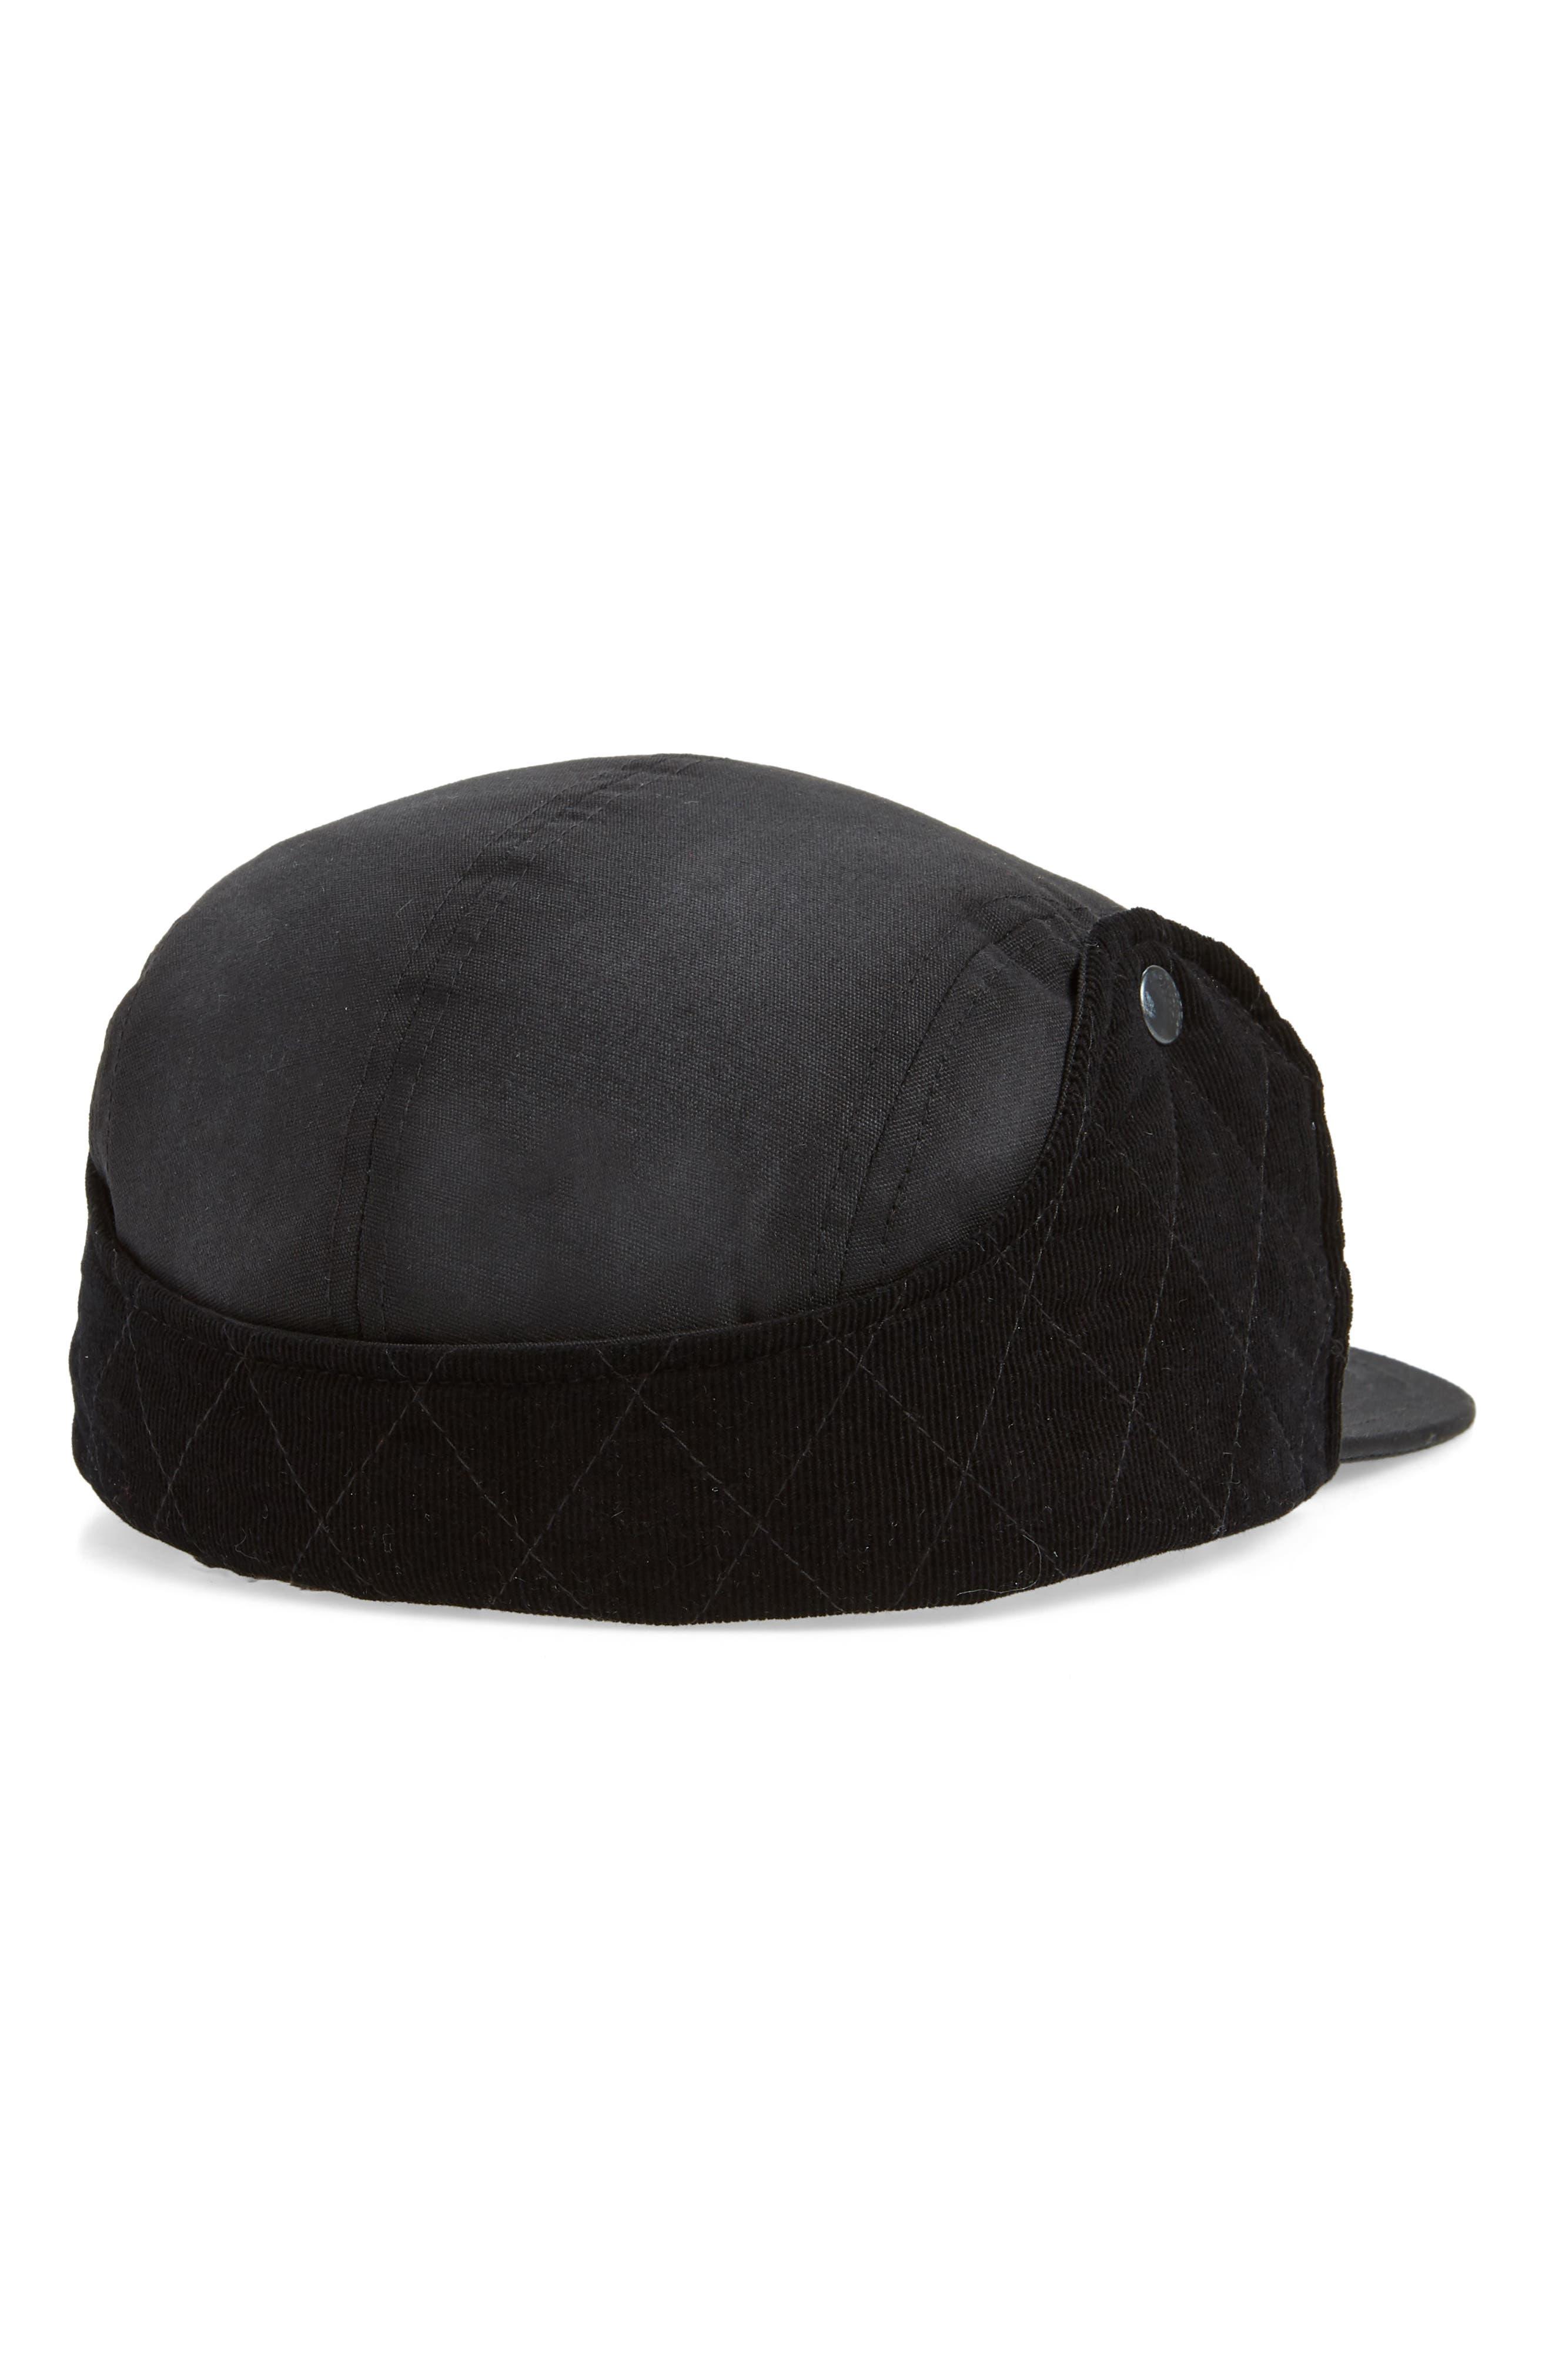 Snap Flap Camper Hat,                             Alternate thumbnail 2, color,                             BLACK